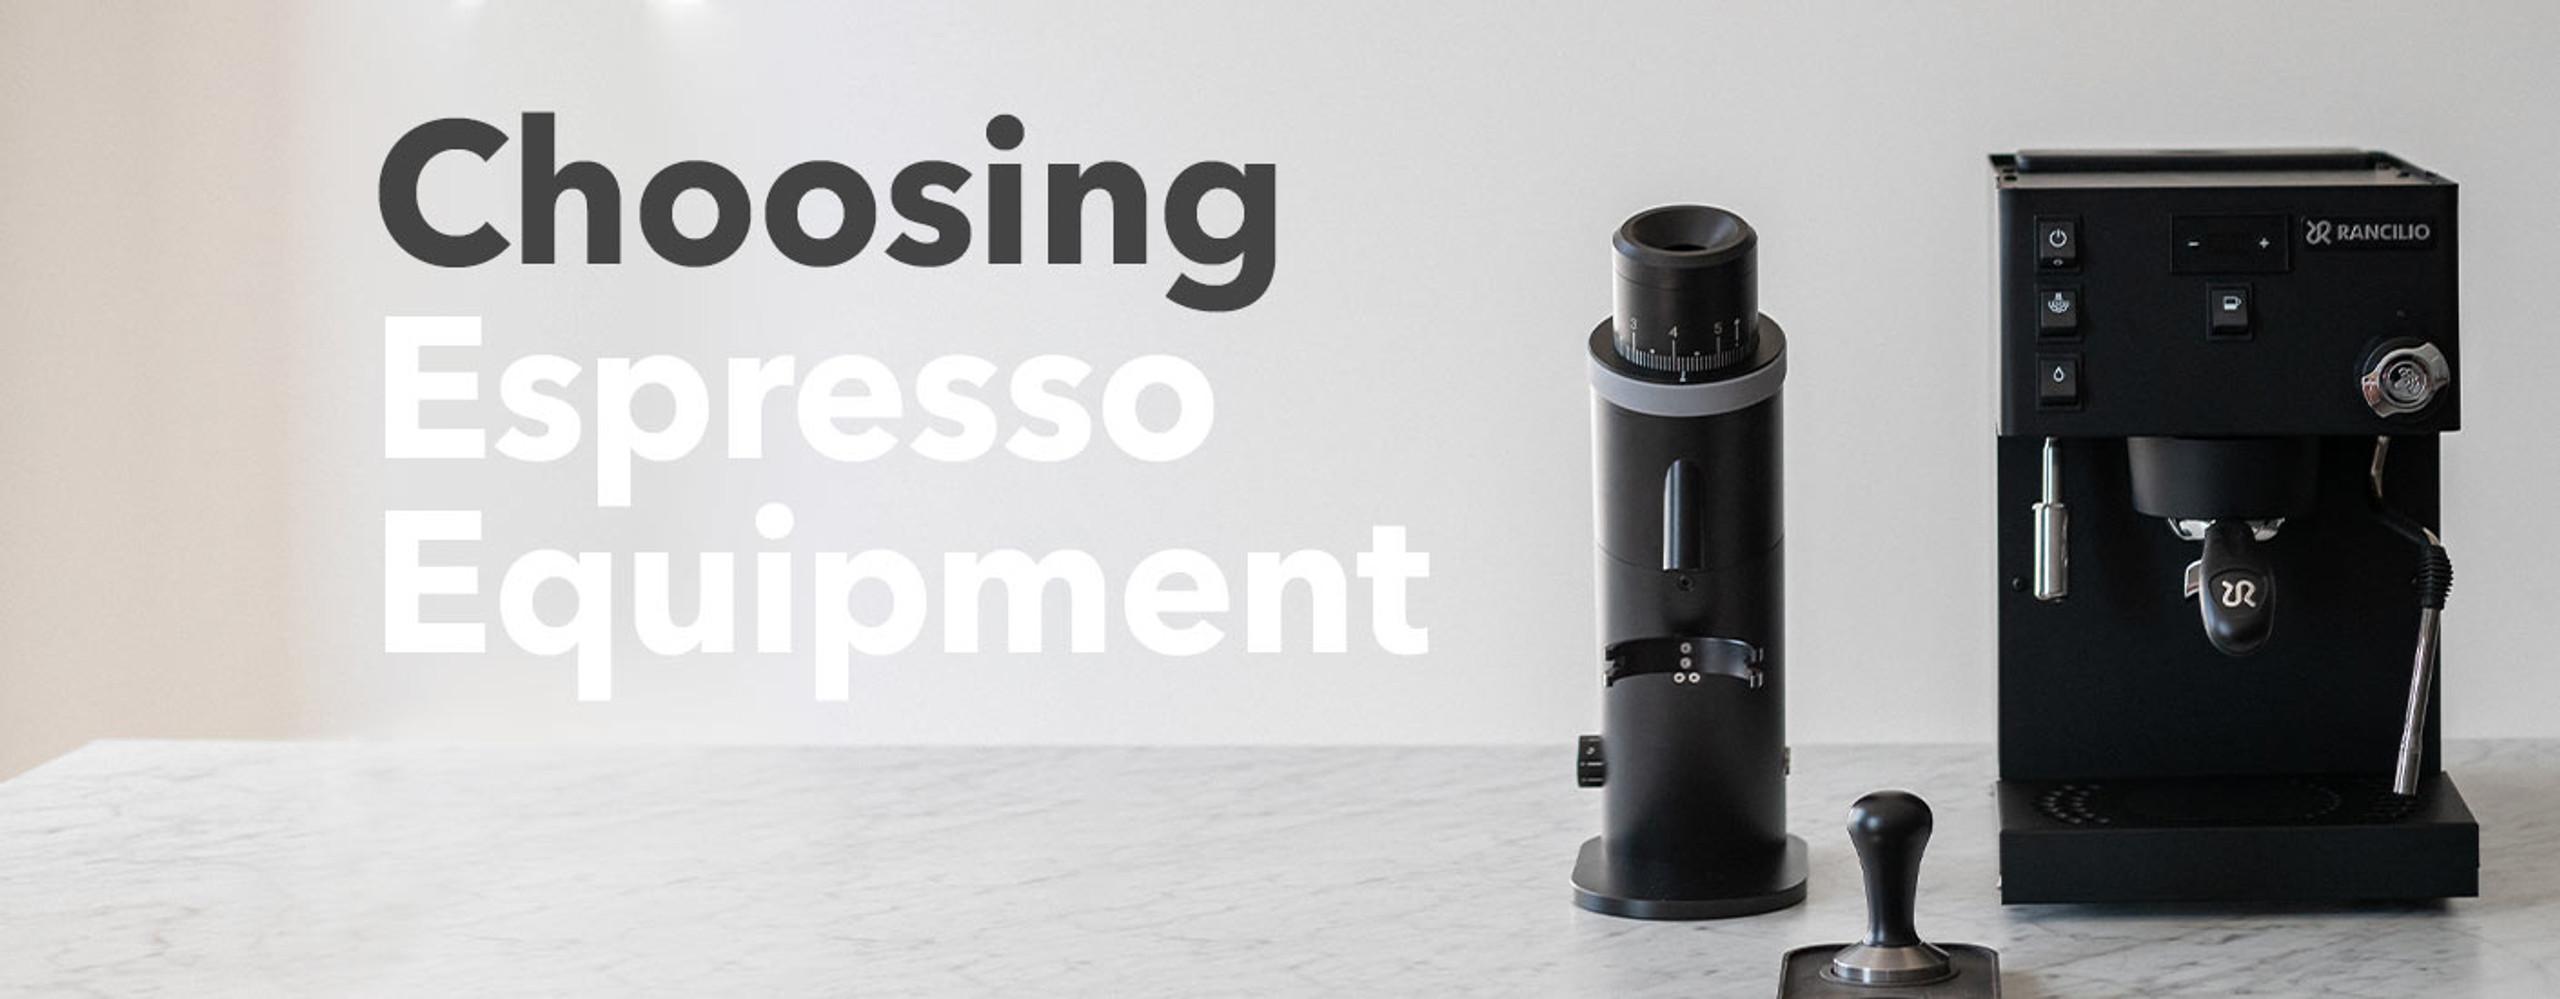 Choosing Espresso Equipment